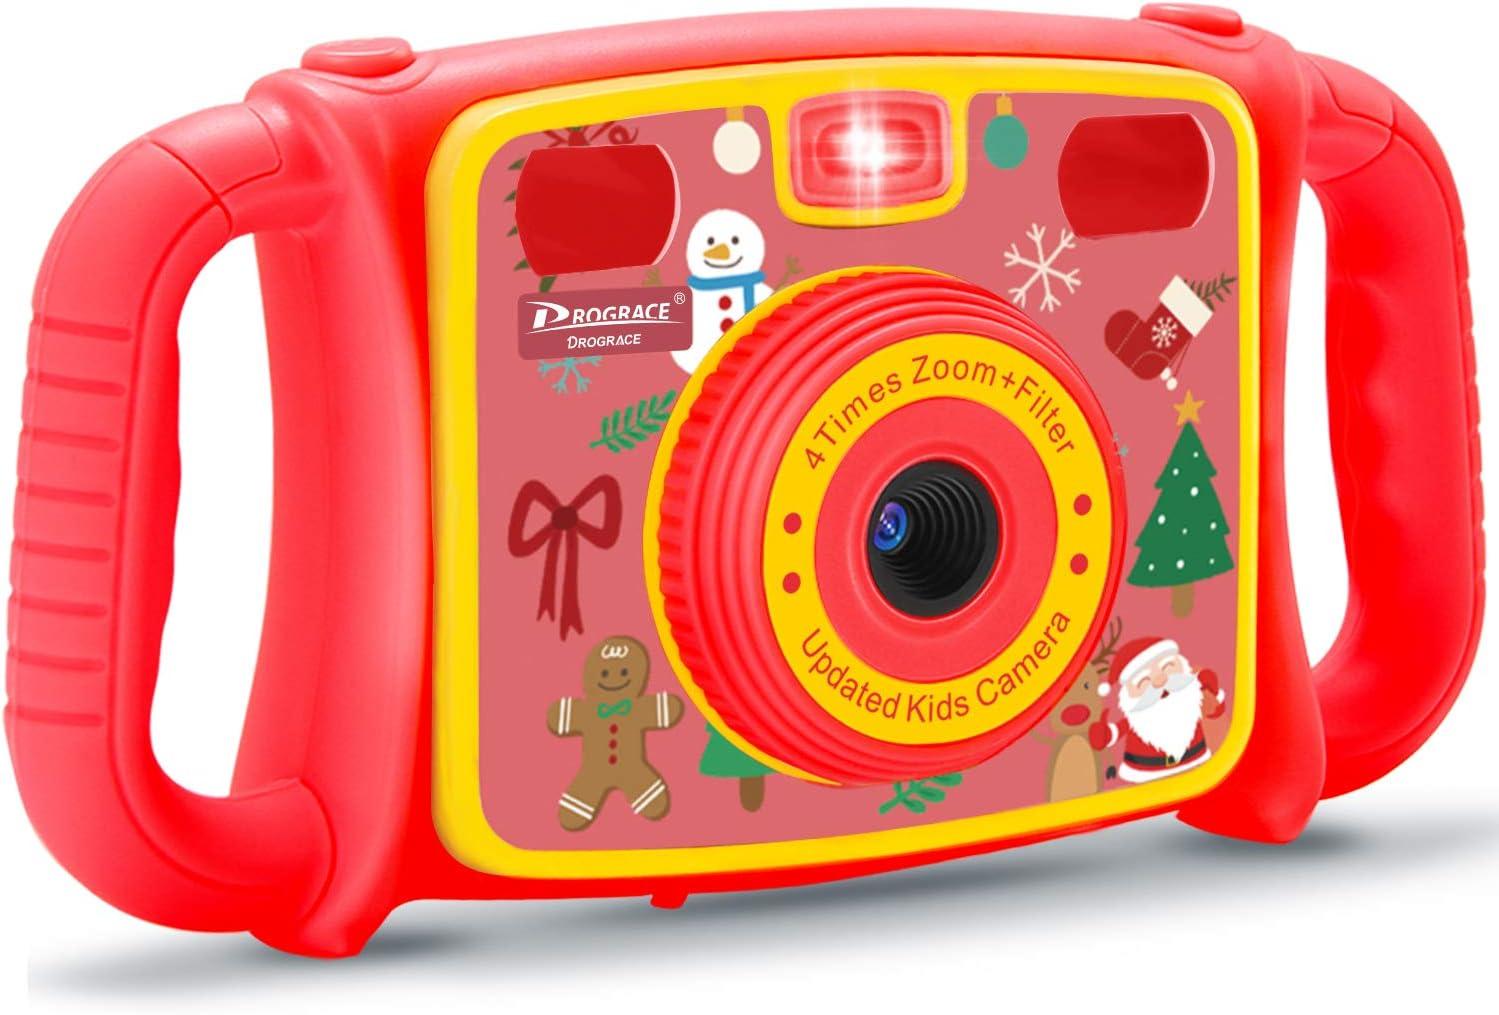 Flash DROGRACE Children Kids Camera 1080P HD Digital Video Camera with 4X Zoom